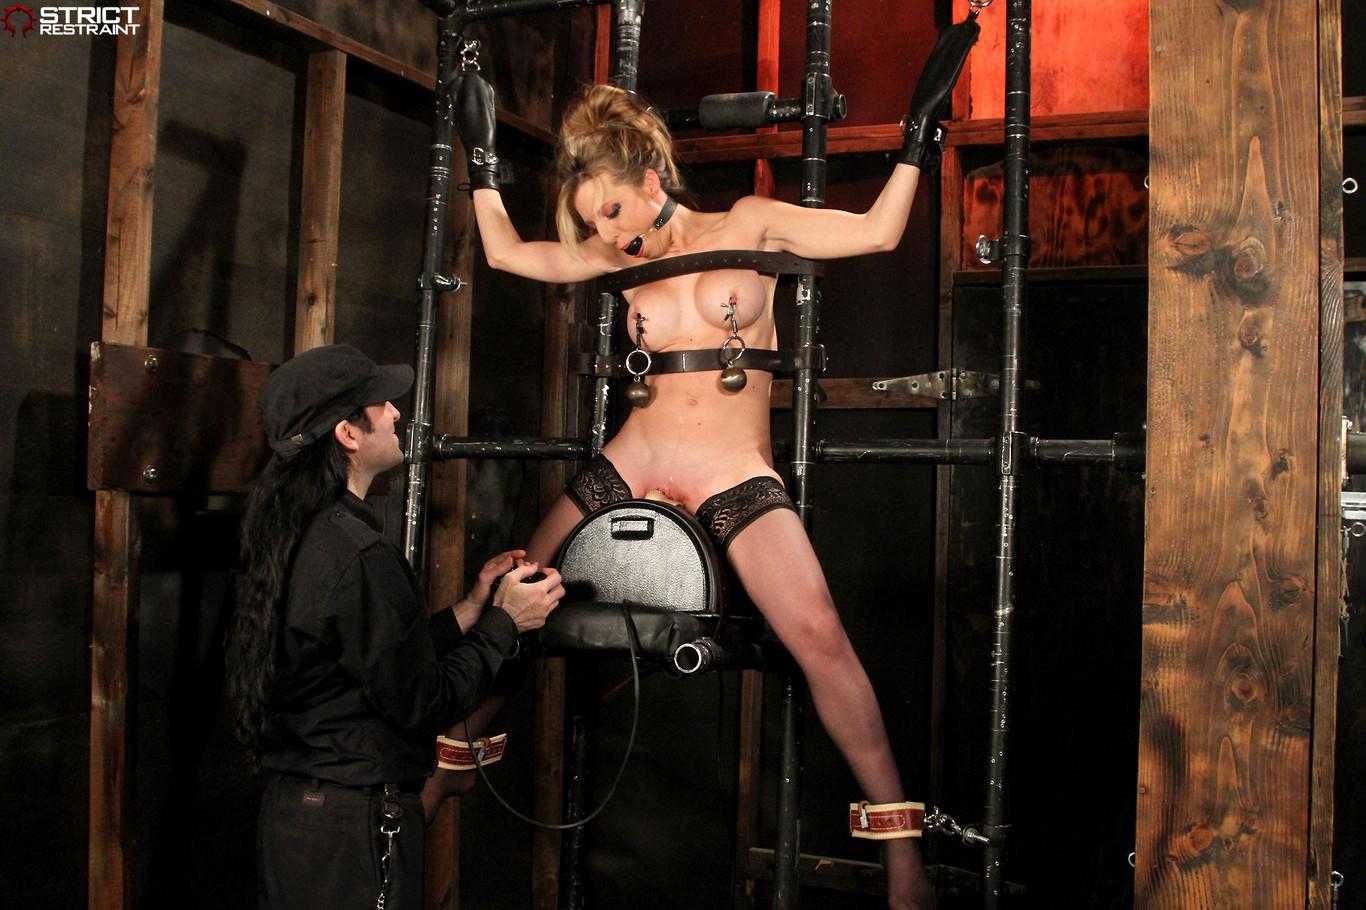 Babe today strict restraint athena angel realtime bondage